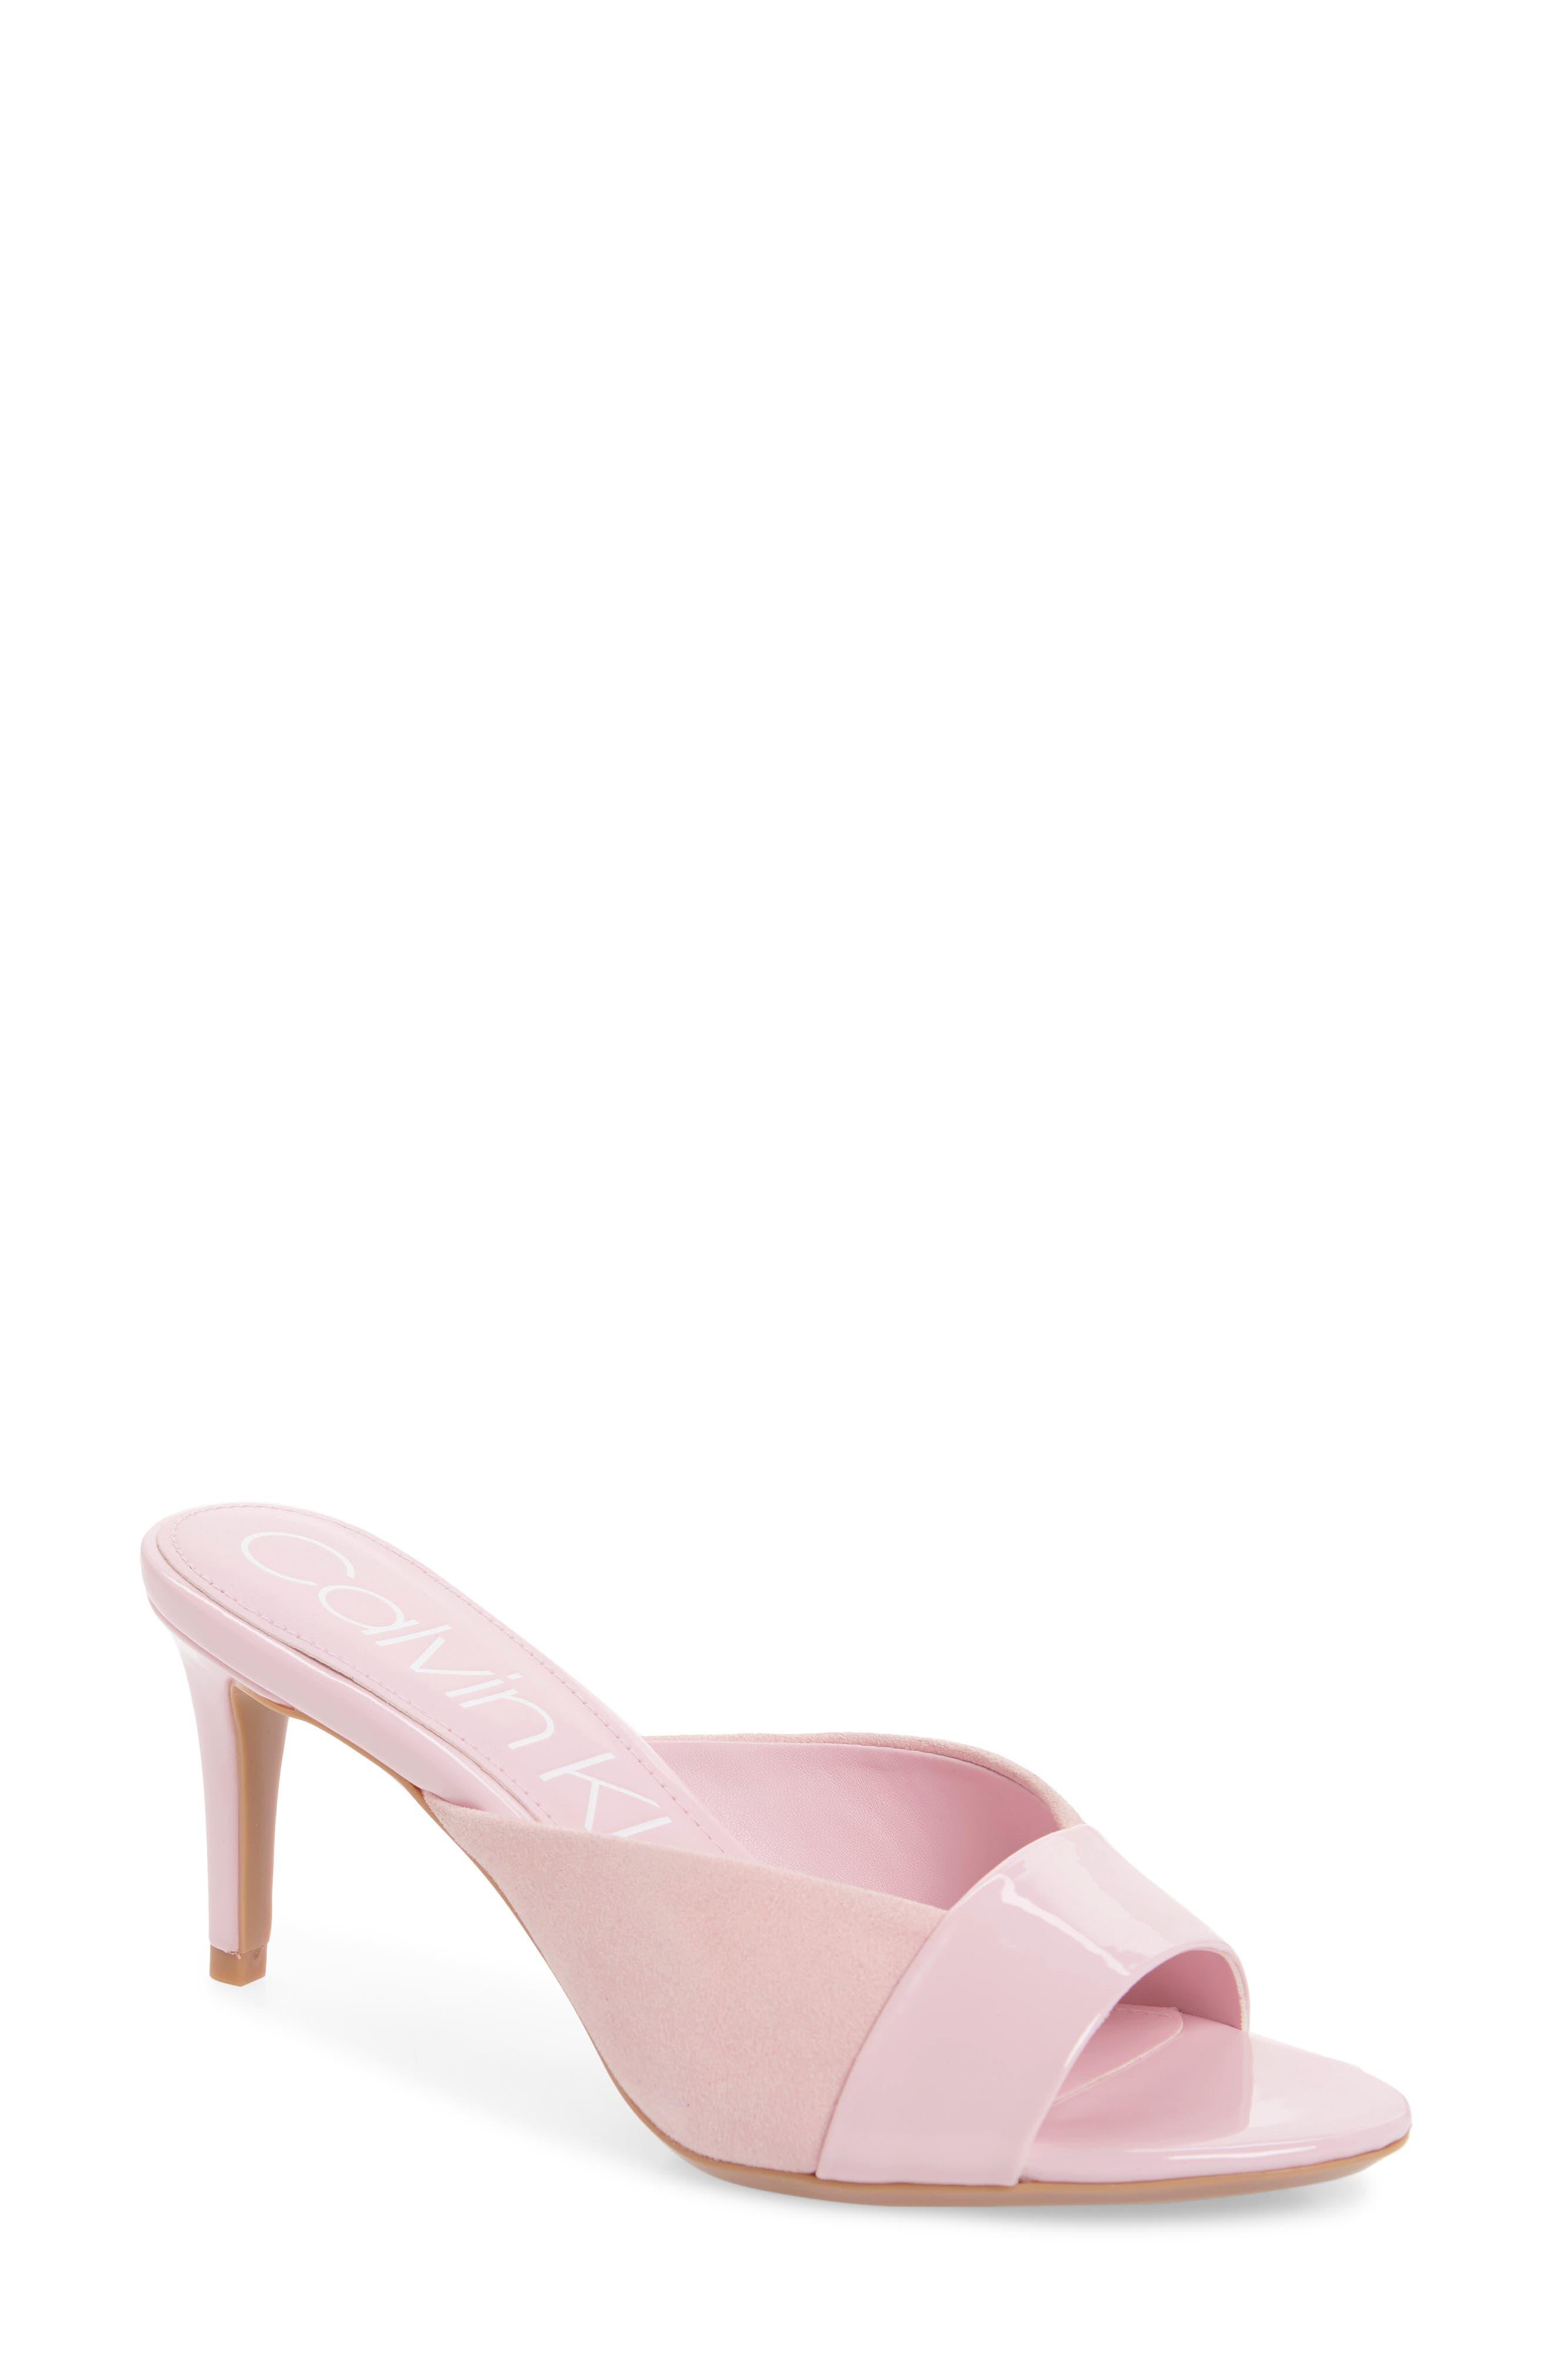 CALVIN KLEIN Laron Slide Sandal, Main, color, PASTEL PINK PATENT LEATHER